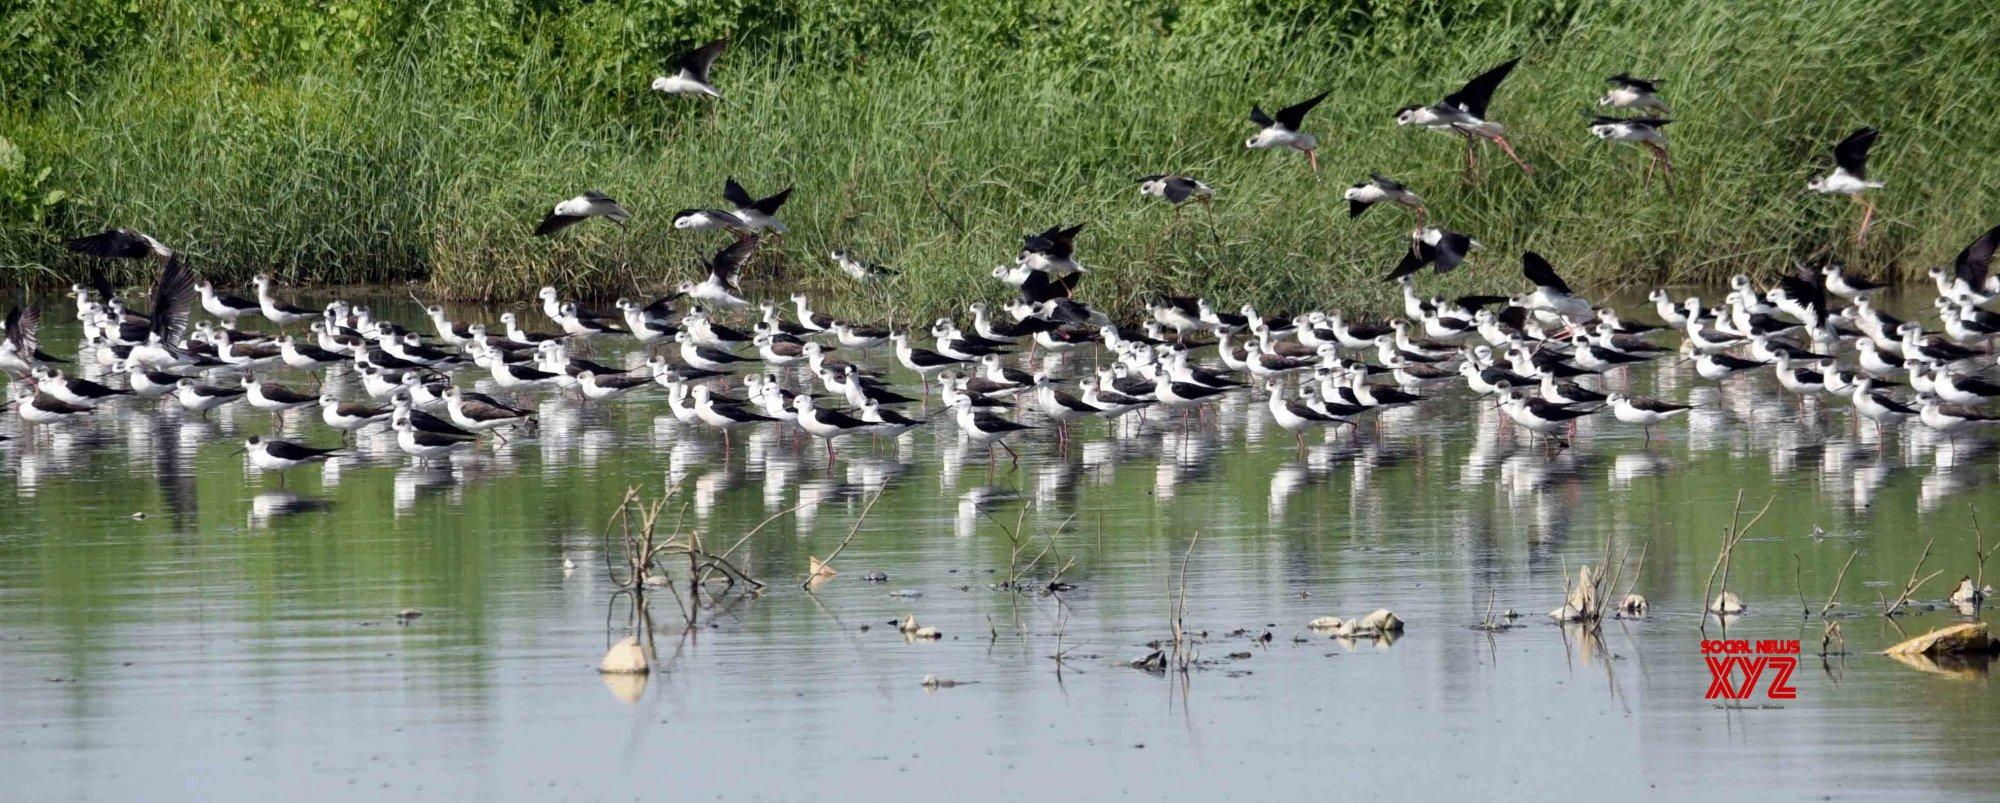 Caged migratory birds seized in Assam village